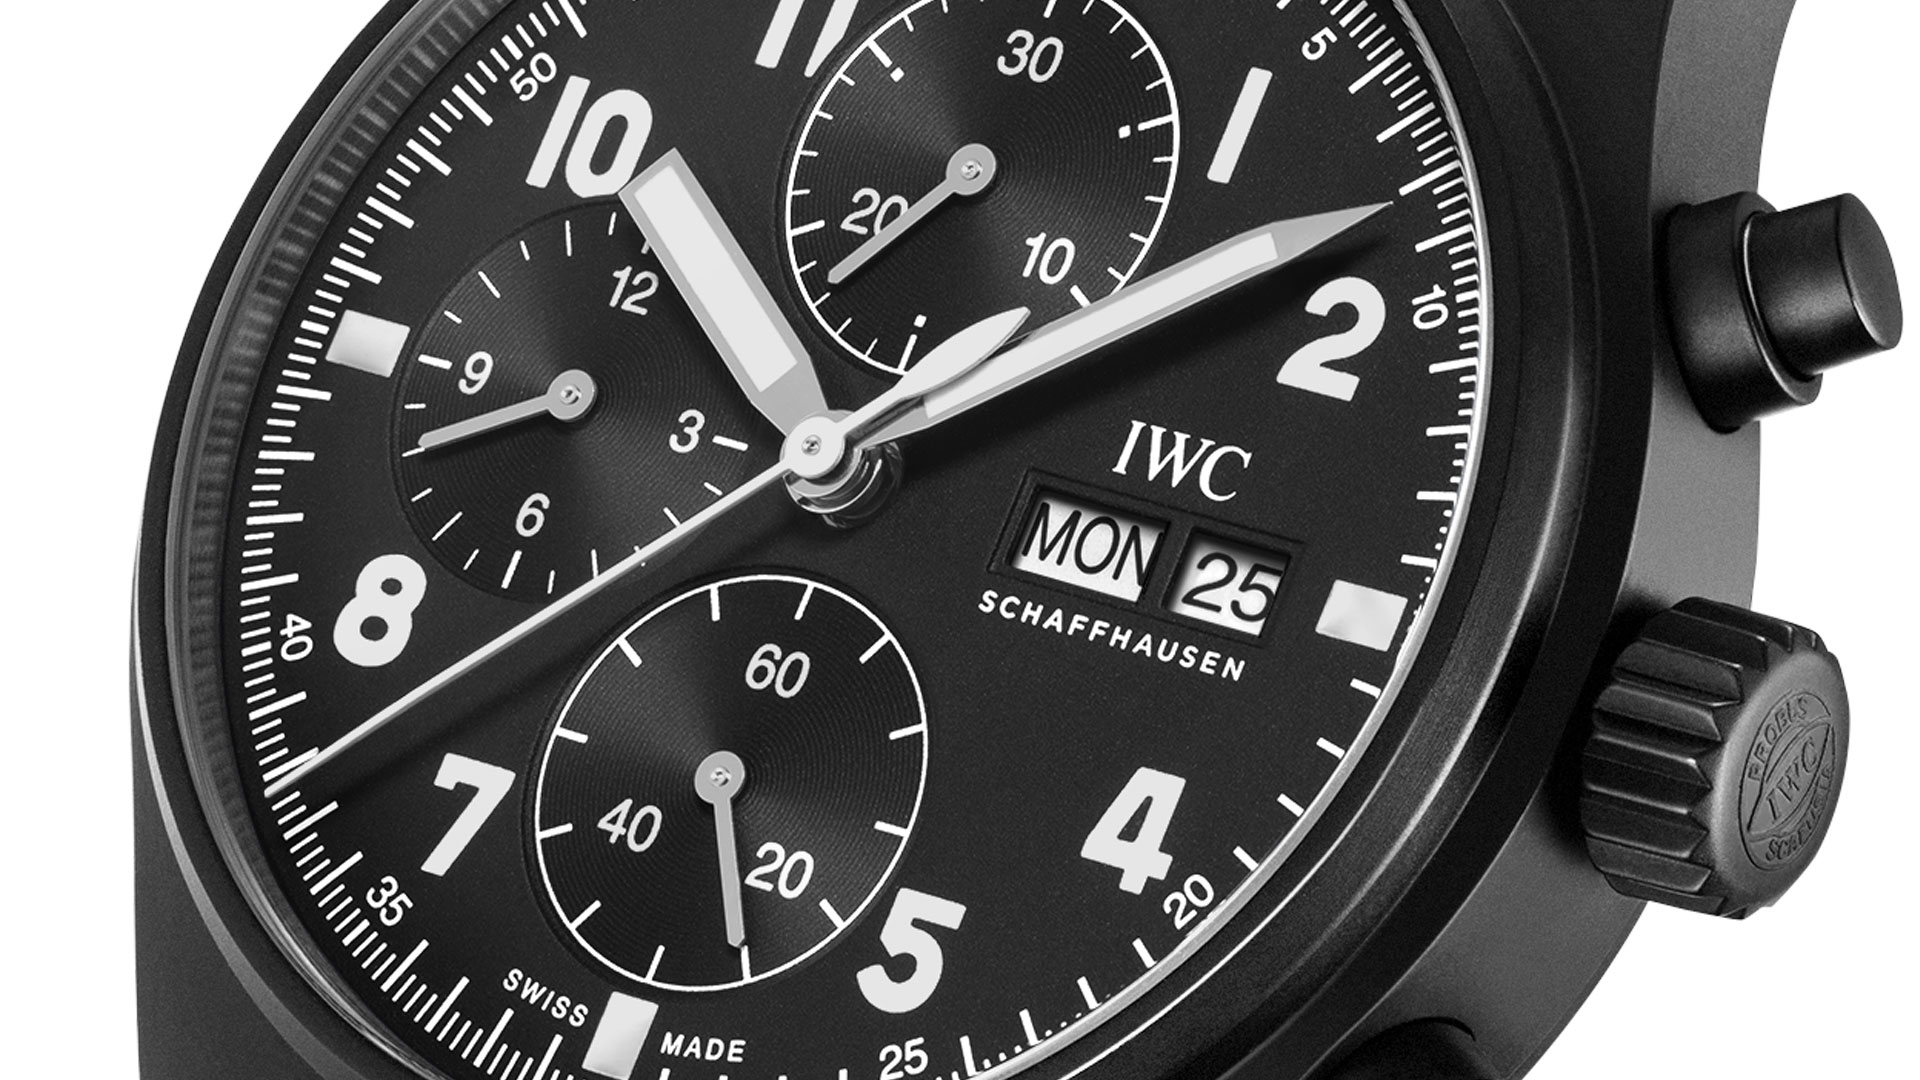 IWC_UHR_DES_MONATS_Maerz2021_PILOTS WATCH CHRONOGRAPH TRIBUTE TO 3705_IW387905